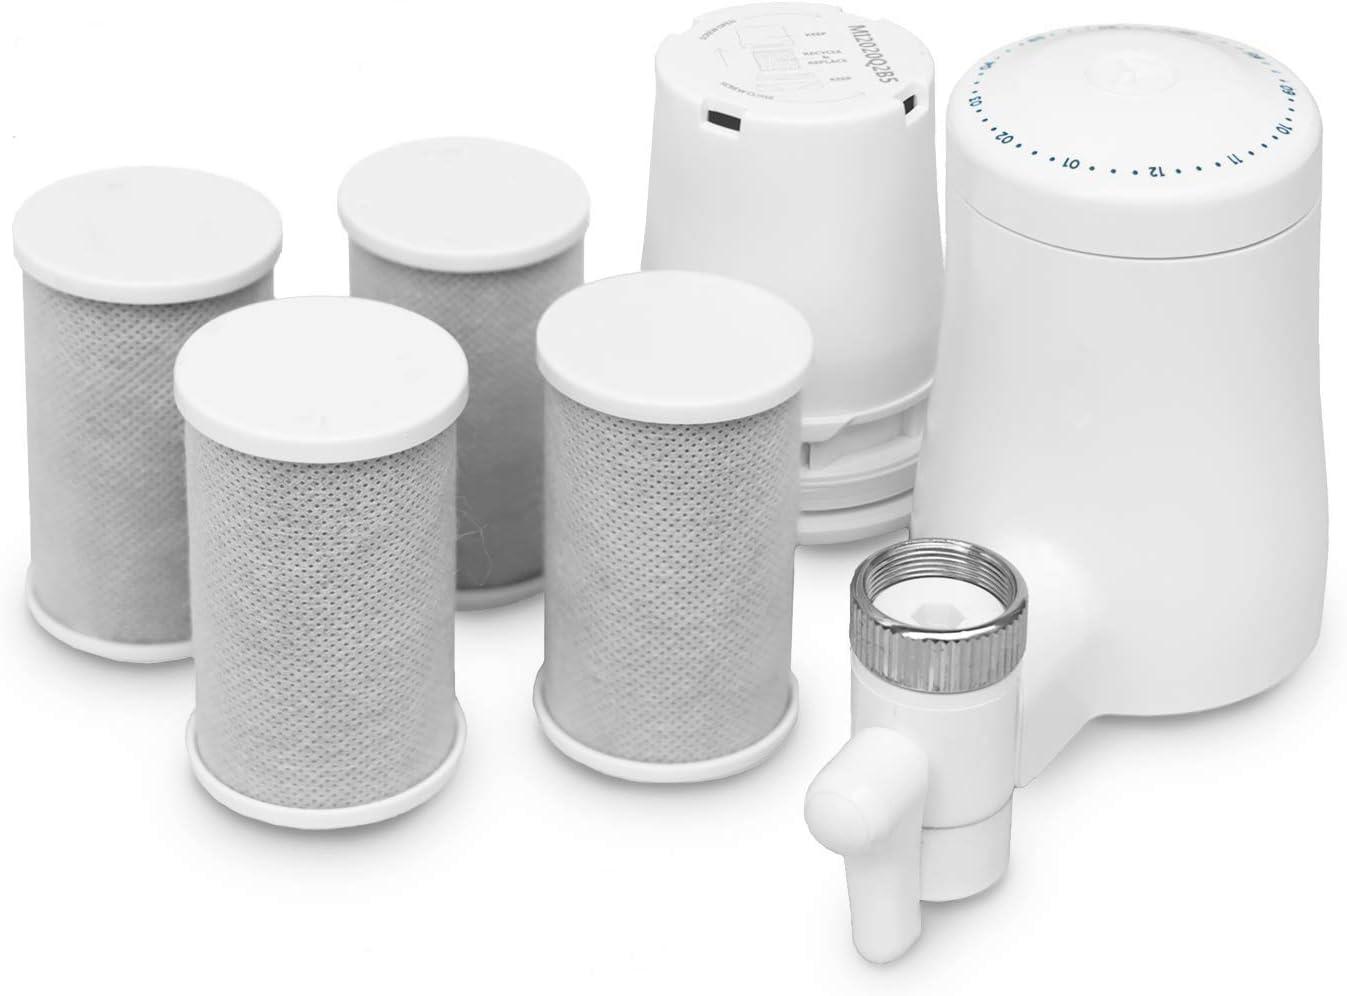 TAPP Water TAPP 2 Twist - Pack Anual - Filtro de Agua para Grifo sostenible (Filtra Cal, Cloro, Plomo, microplásticos) Filtro Cocina: Amazon.es: Hogar